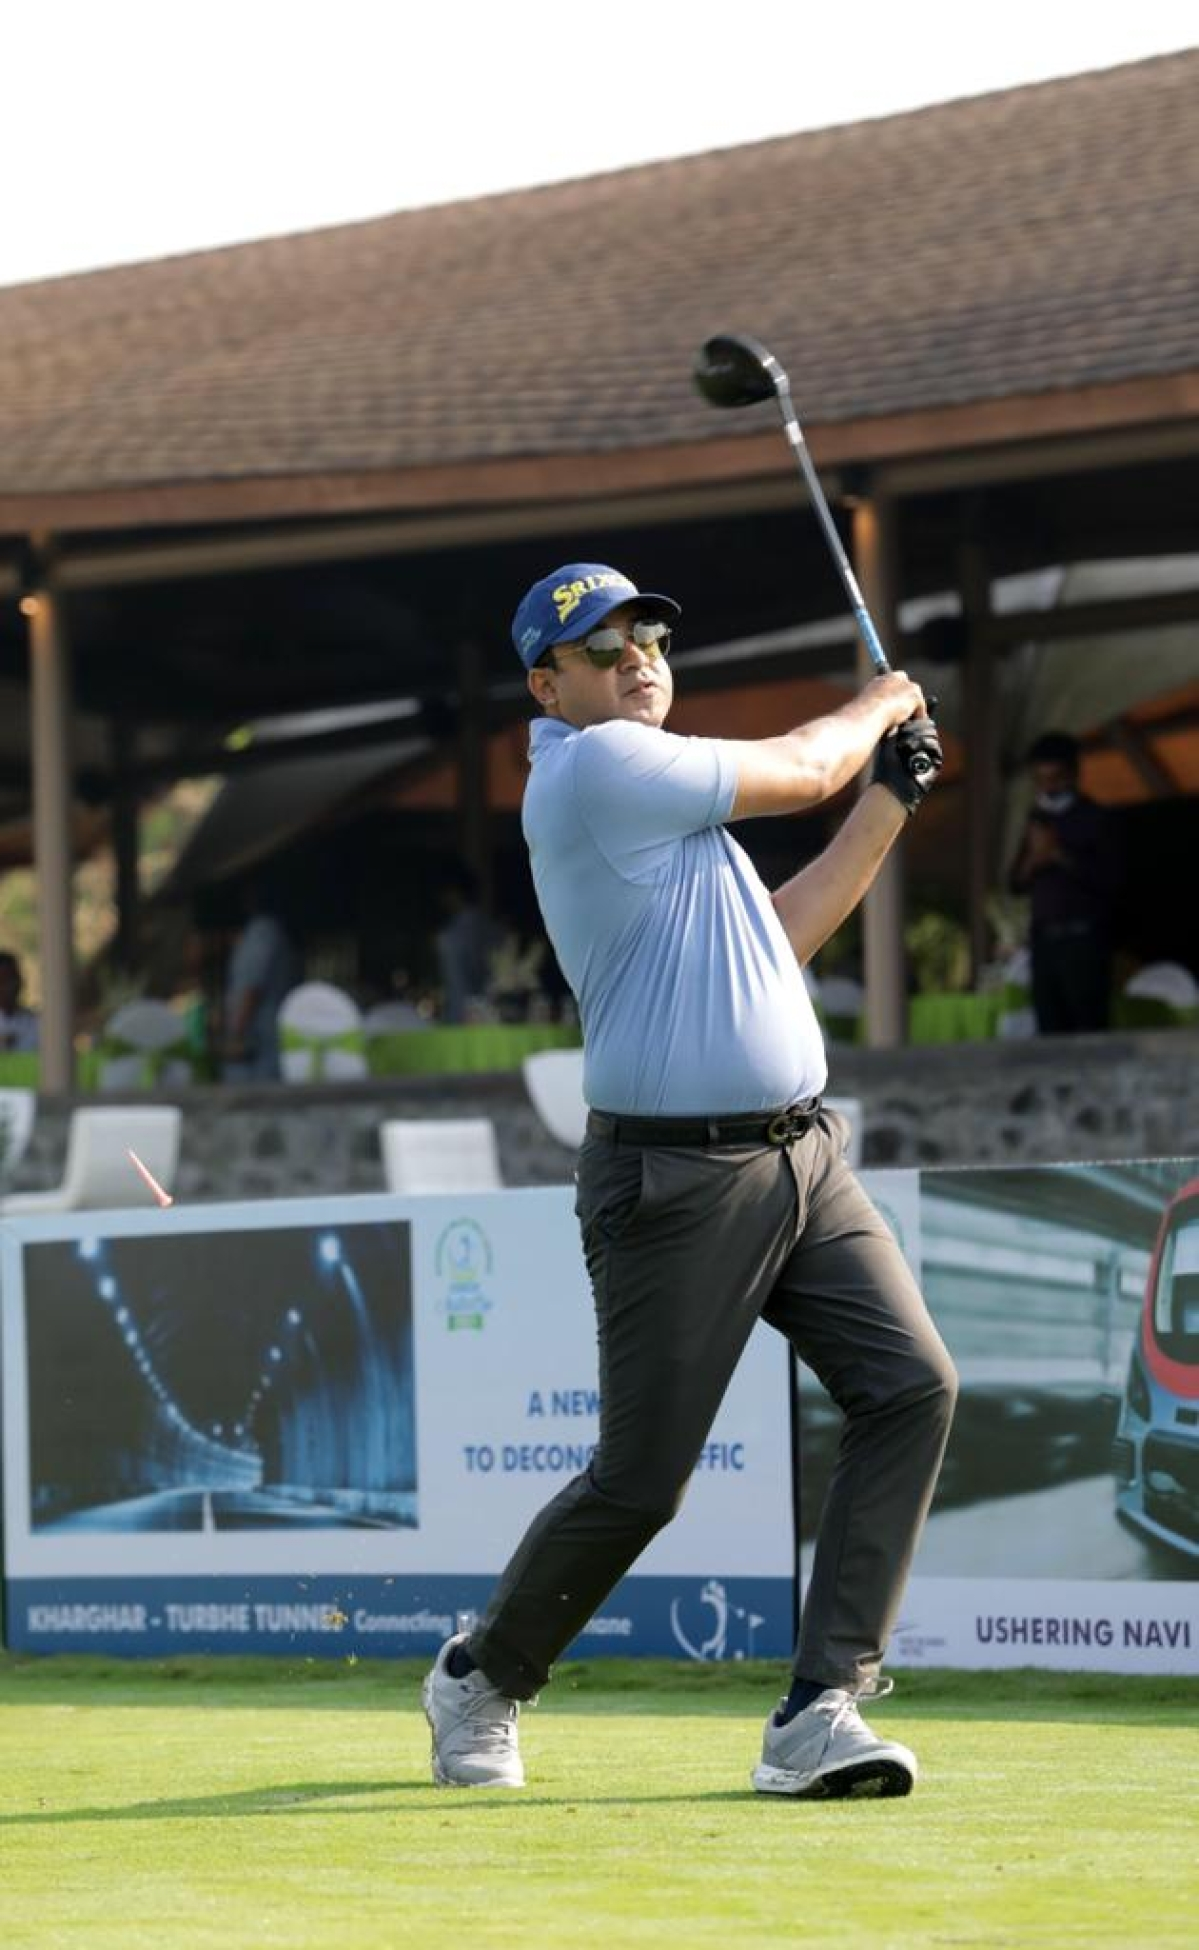 International Golf Course will prove to be Navi Mumbai's pride, says Minister Eknath Shinde